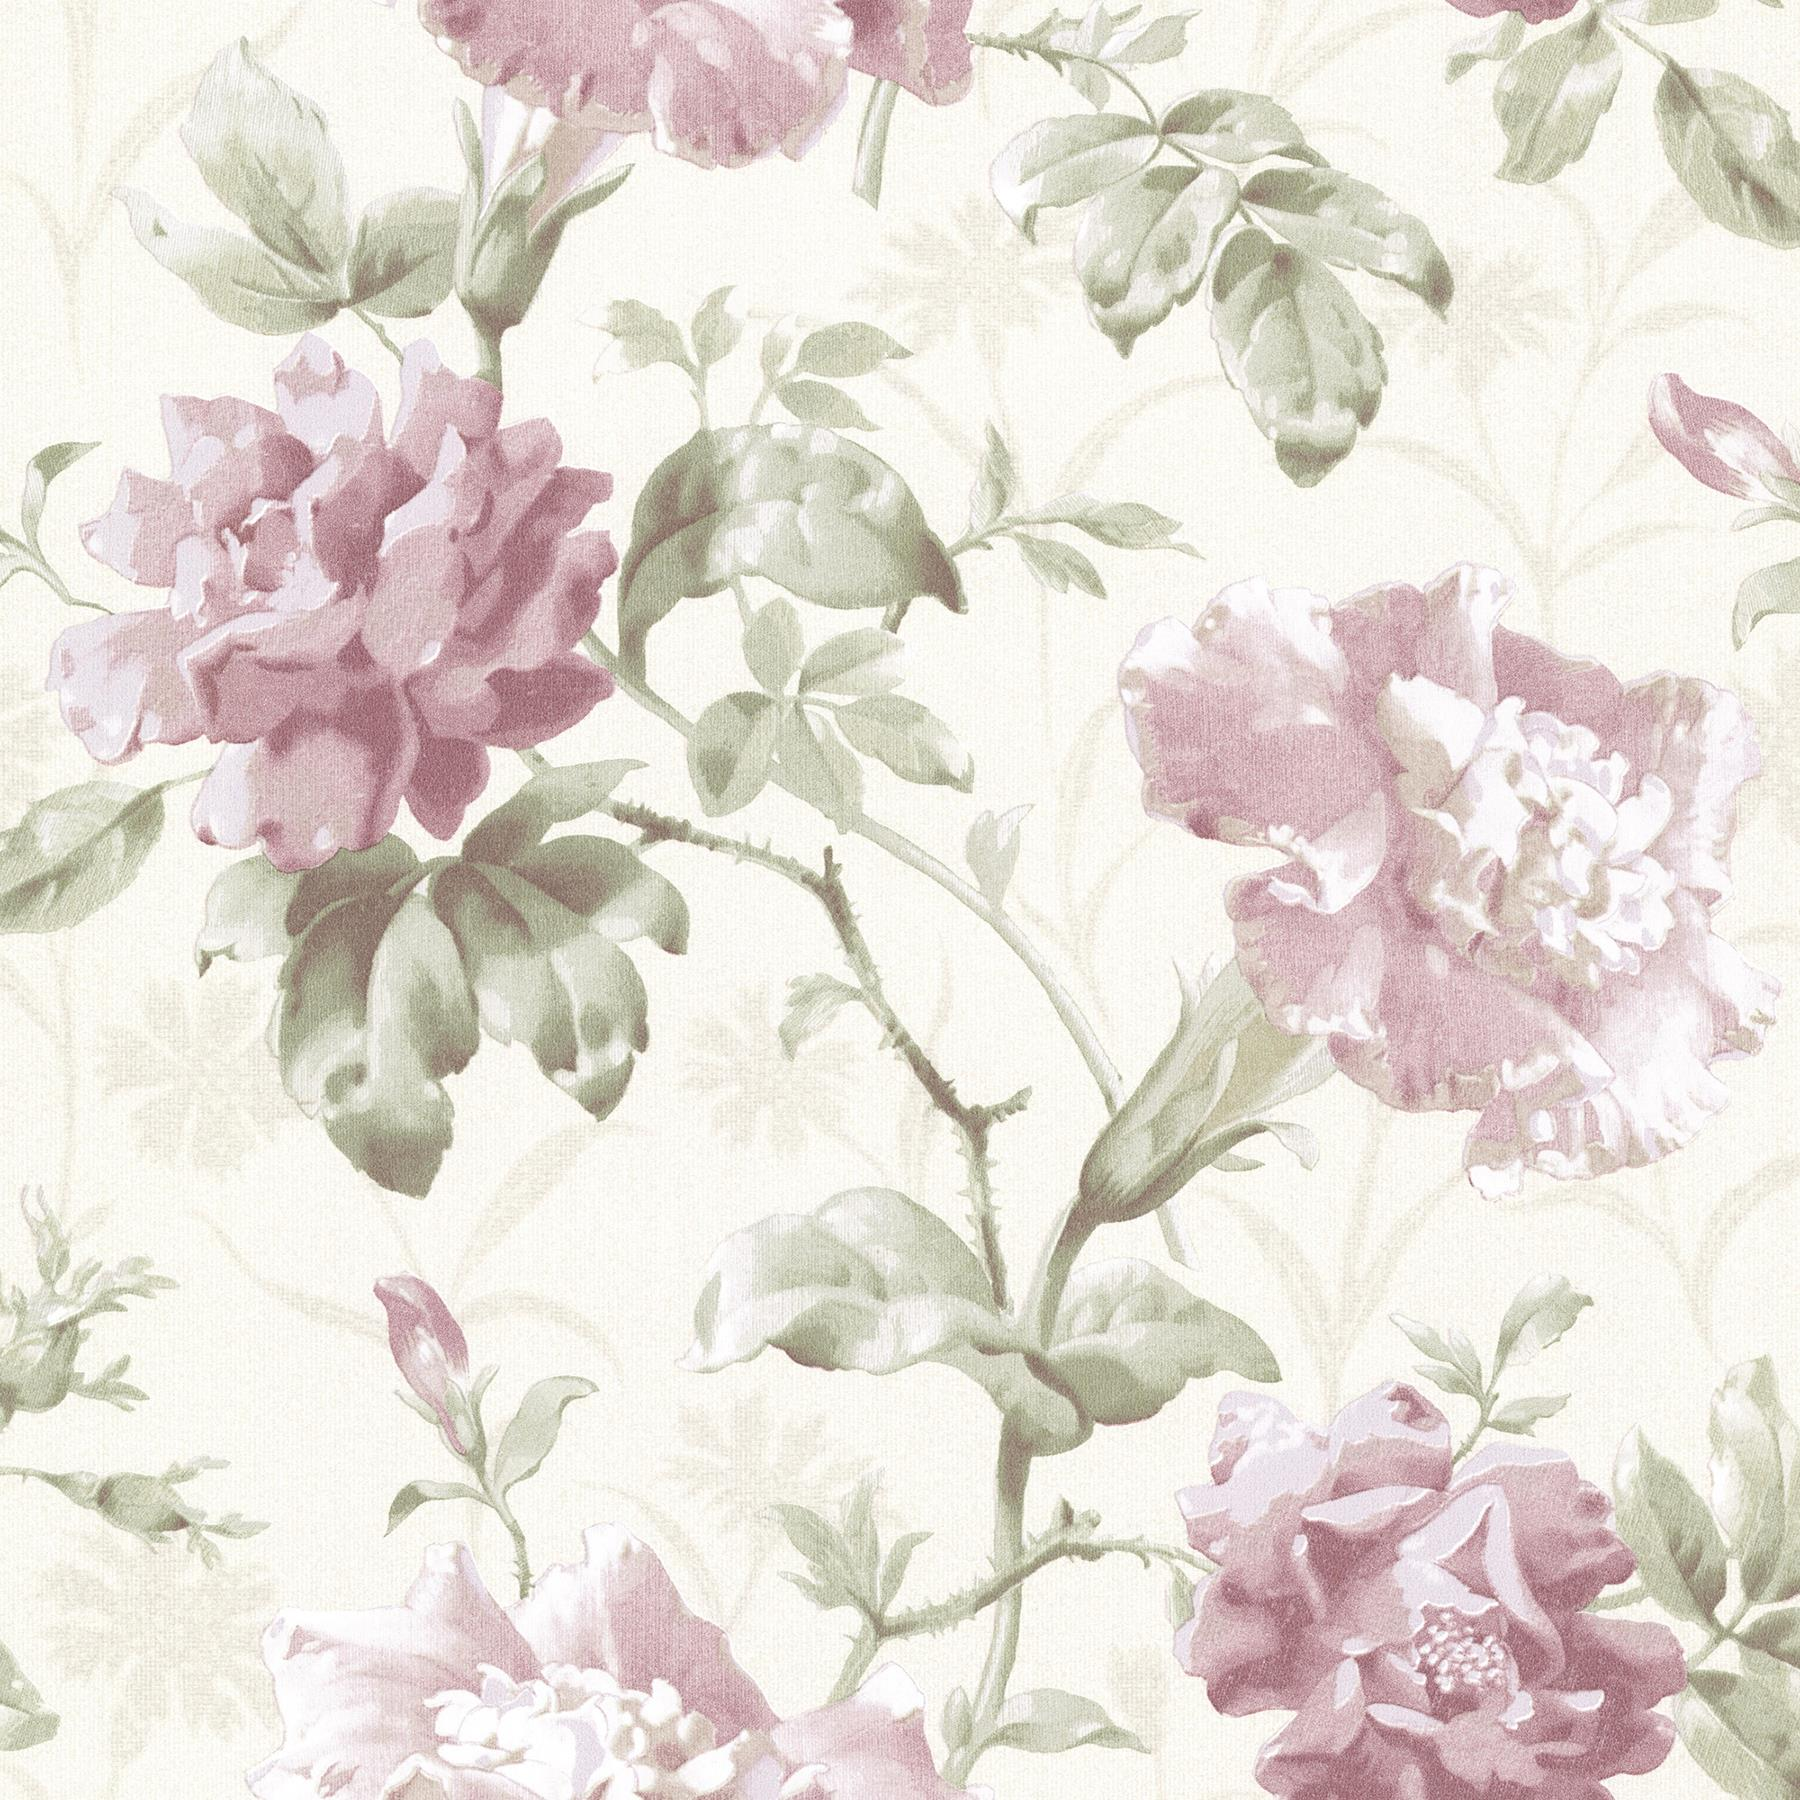 Floral Garden Wallpaper Rose Flower Vintage Retro ...